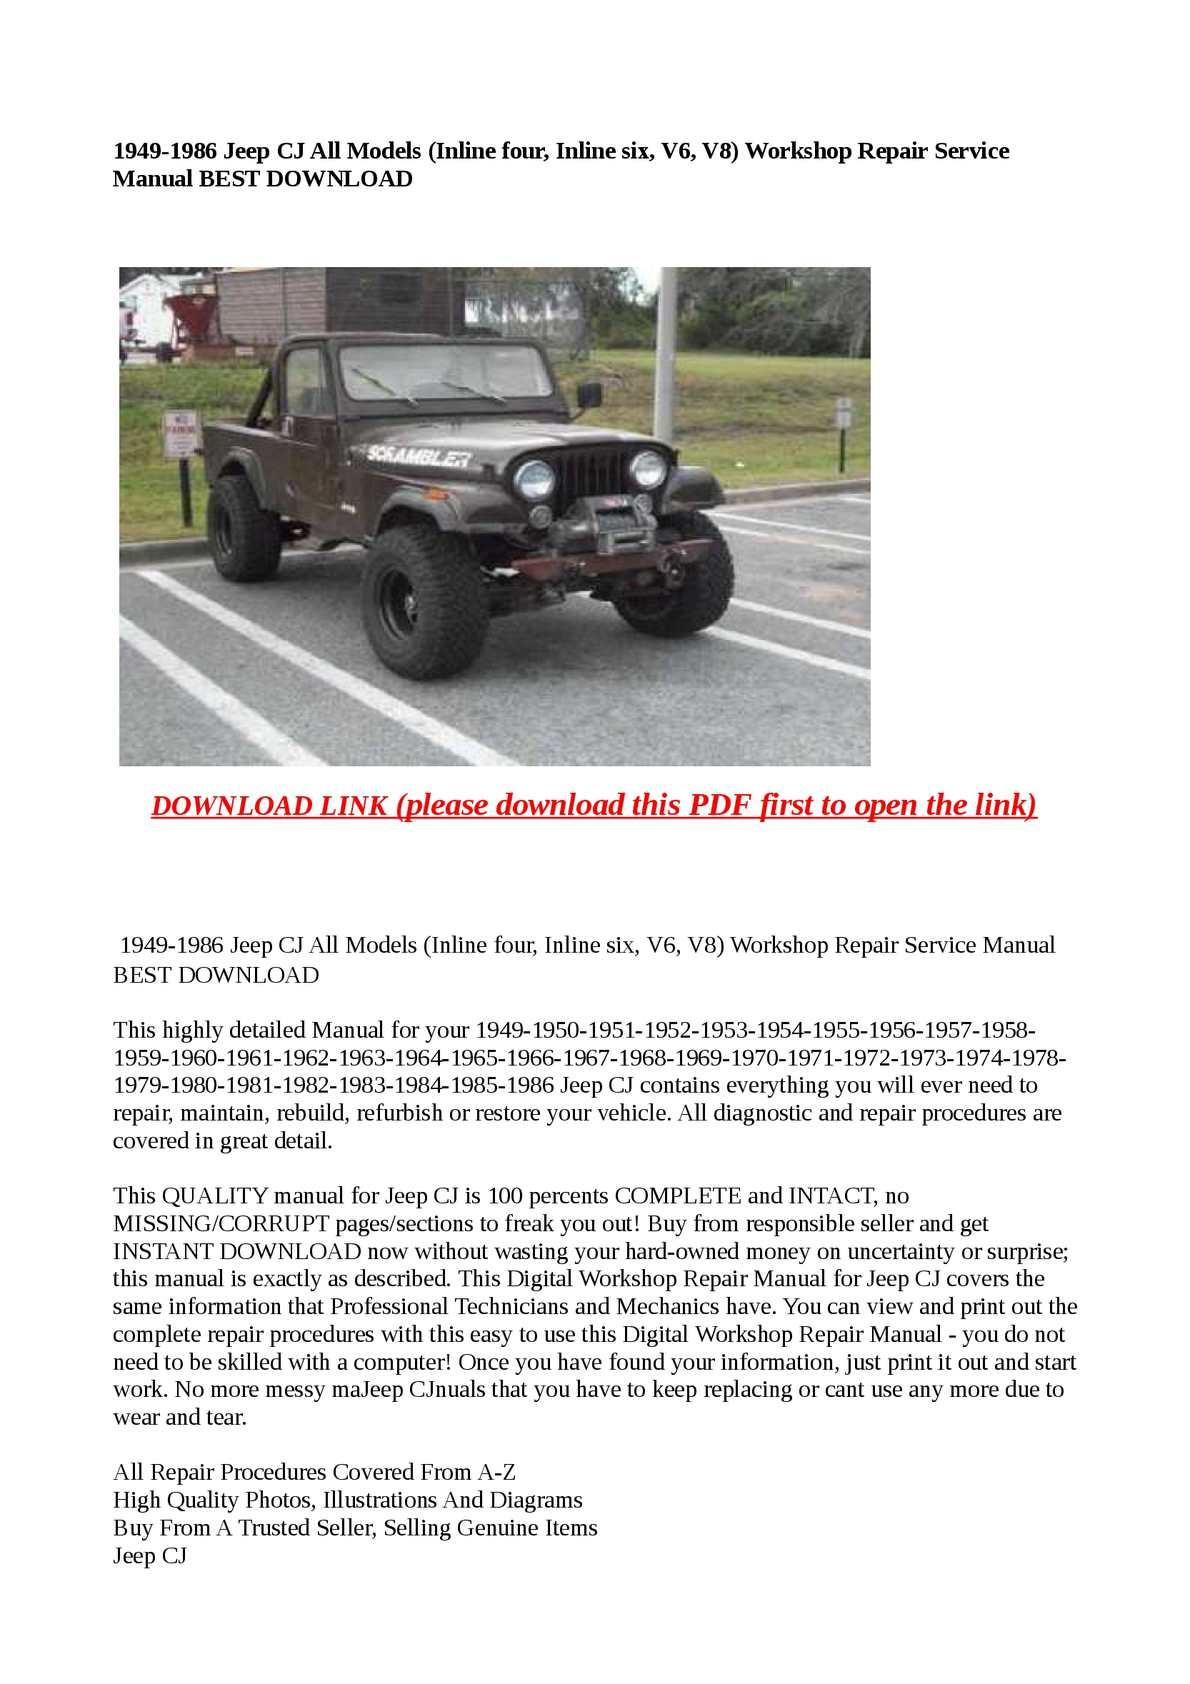 Calamo 1949 1986 Jeep Cj All Models Inline Four Six V6 1974 Series 3 Land Rover Wiring Diagram V8 Wor